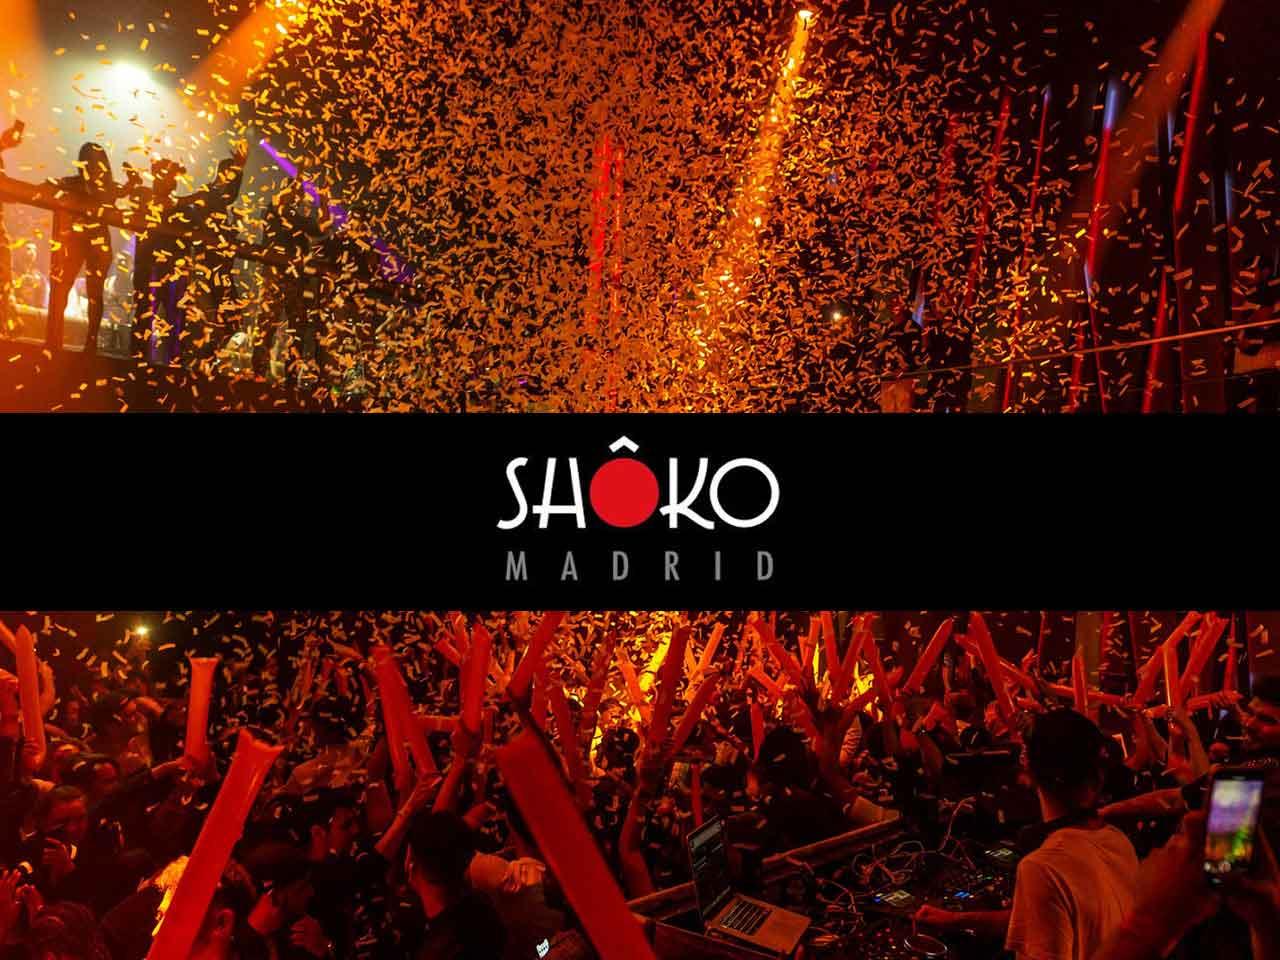 Shoko in Madrid Club